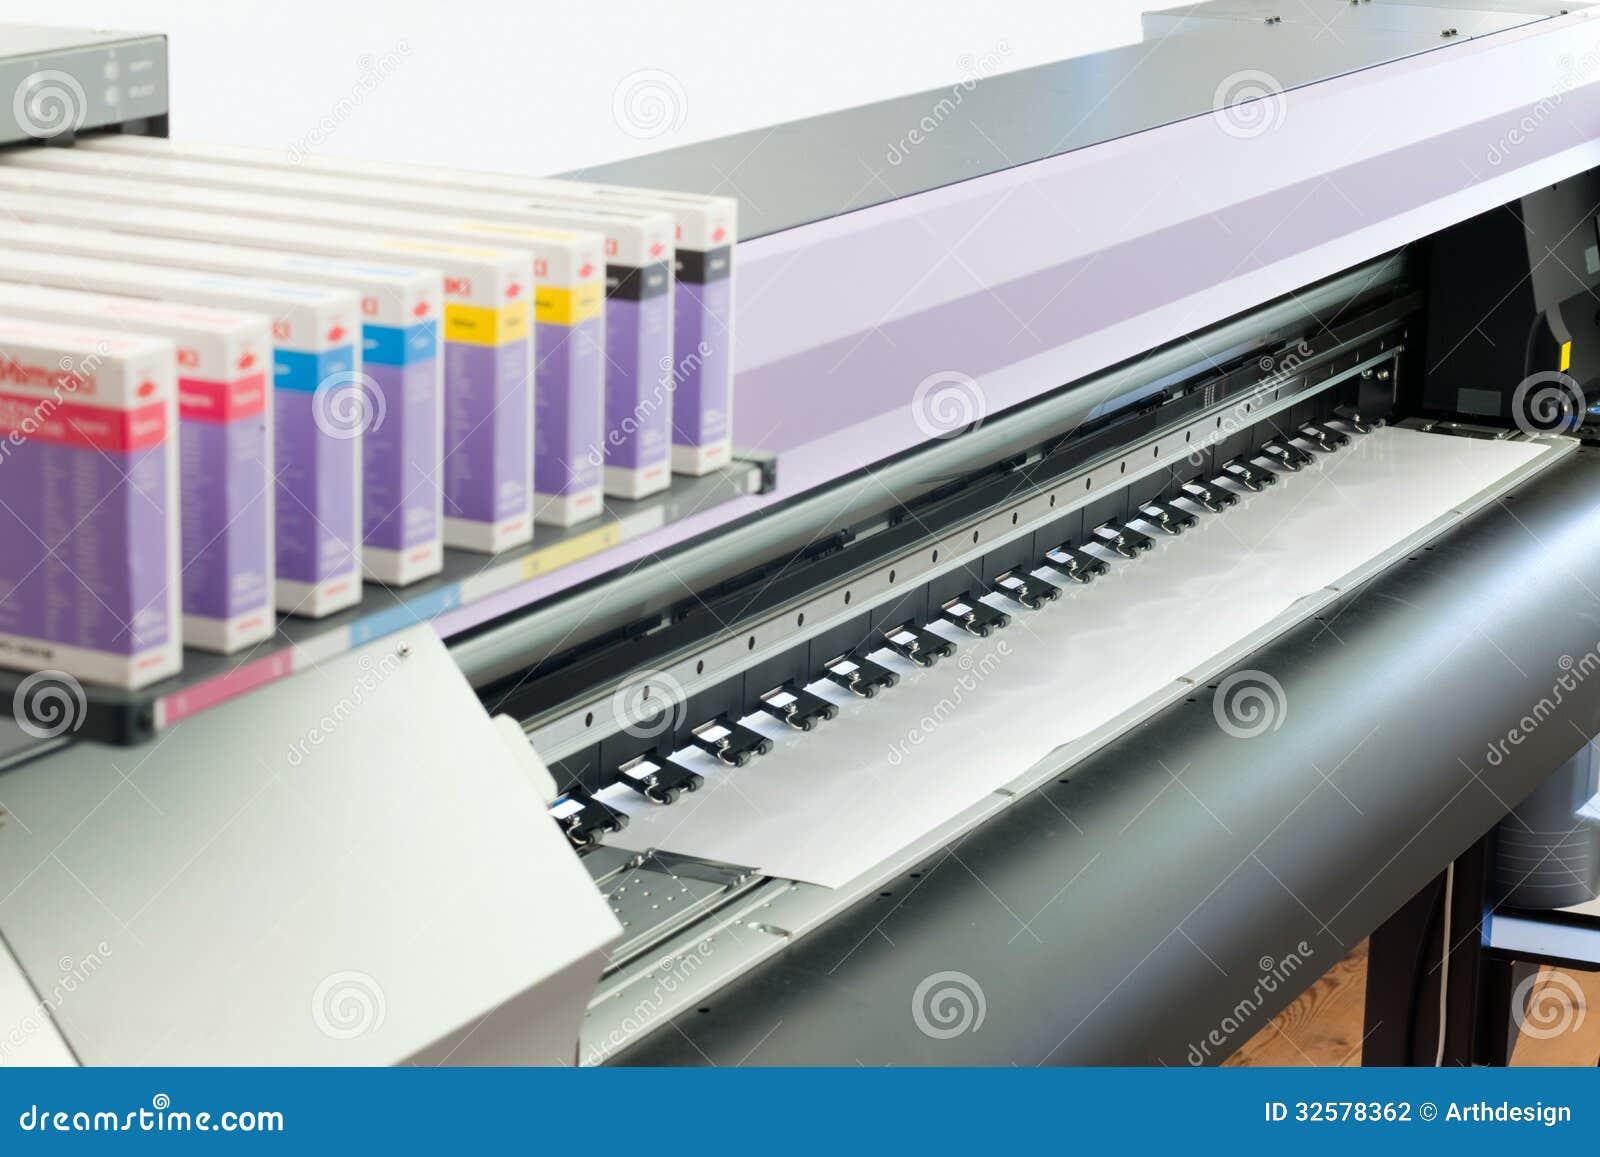 Cymk Puzzle Ink Jet Printer Stock Photography Image 32578362